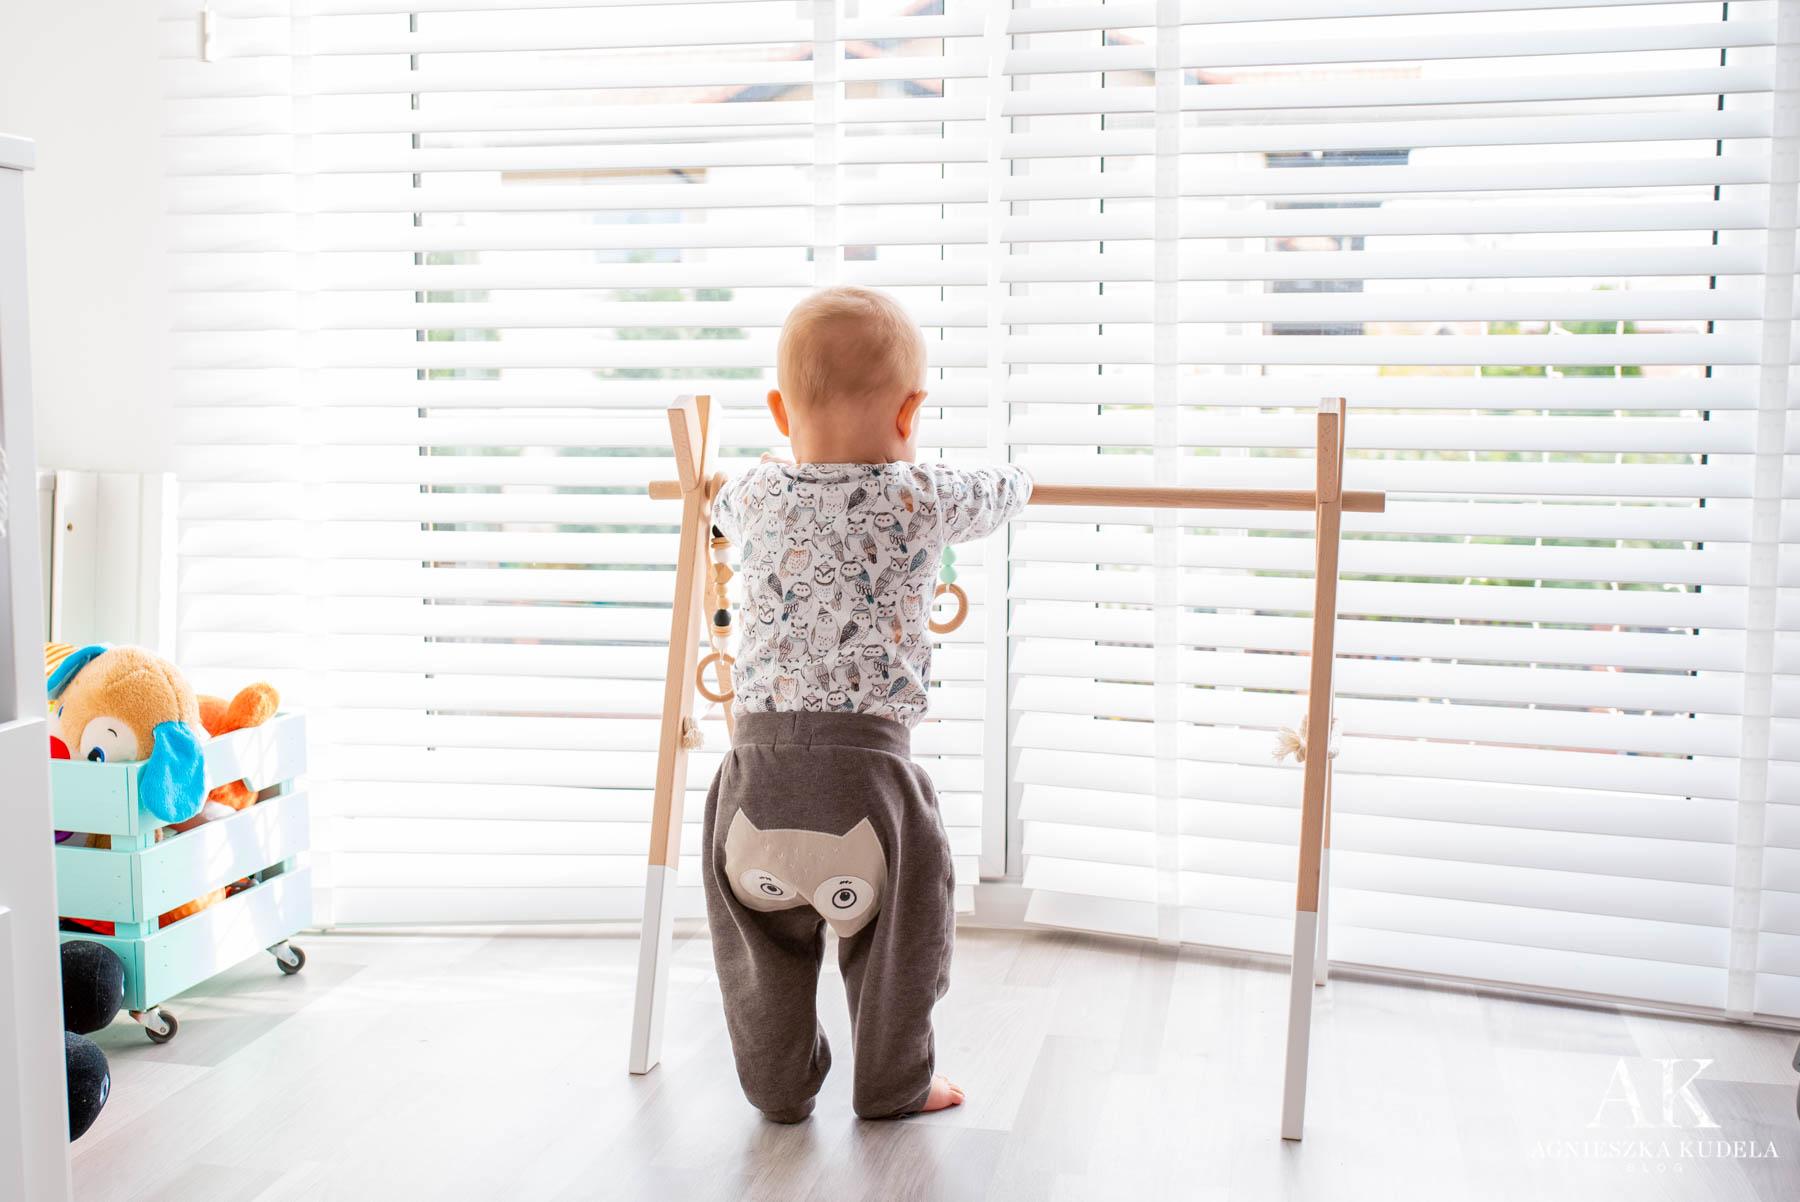 Baby Gym zabawka sensoryczna montessori